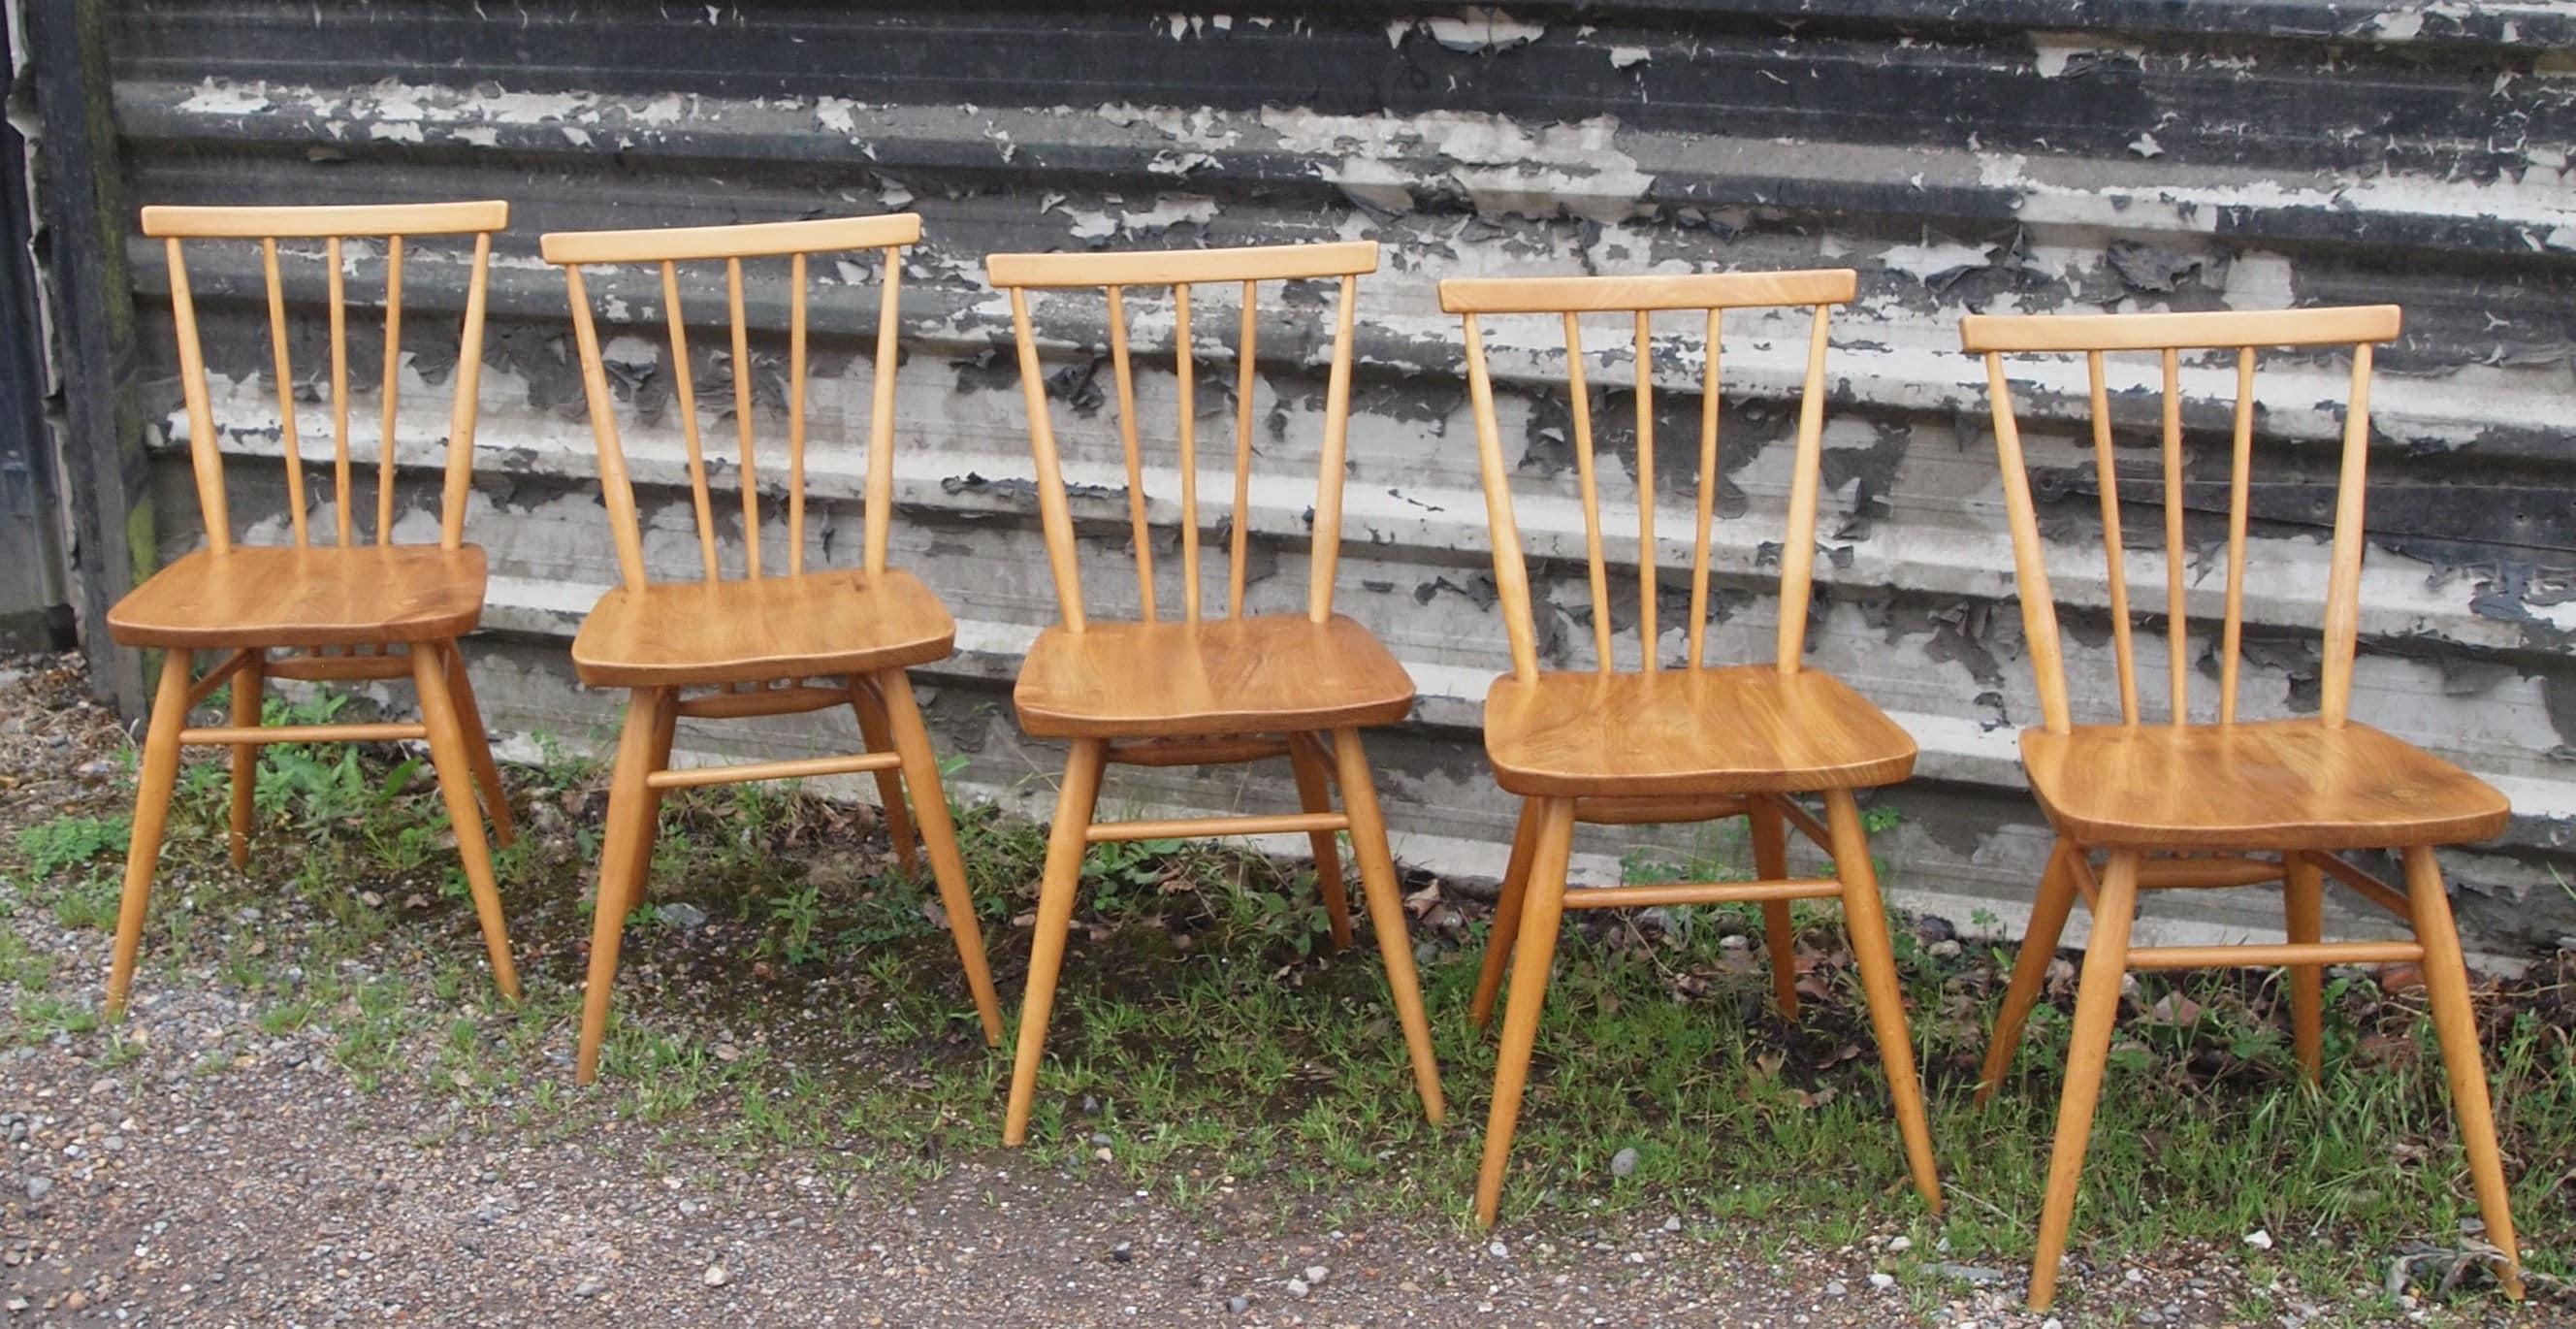 5 Ercol 391 All Purpose Chairs